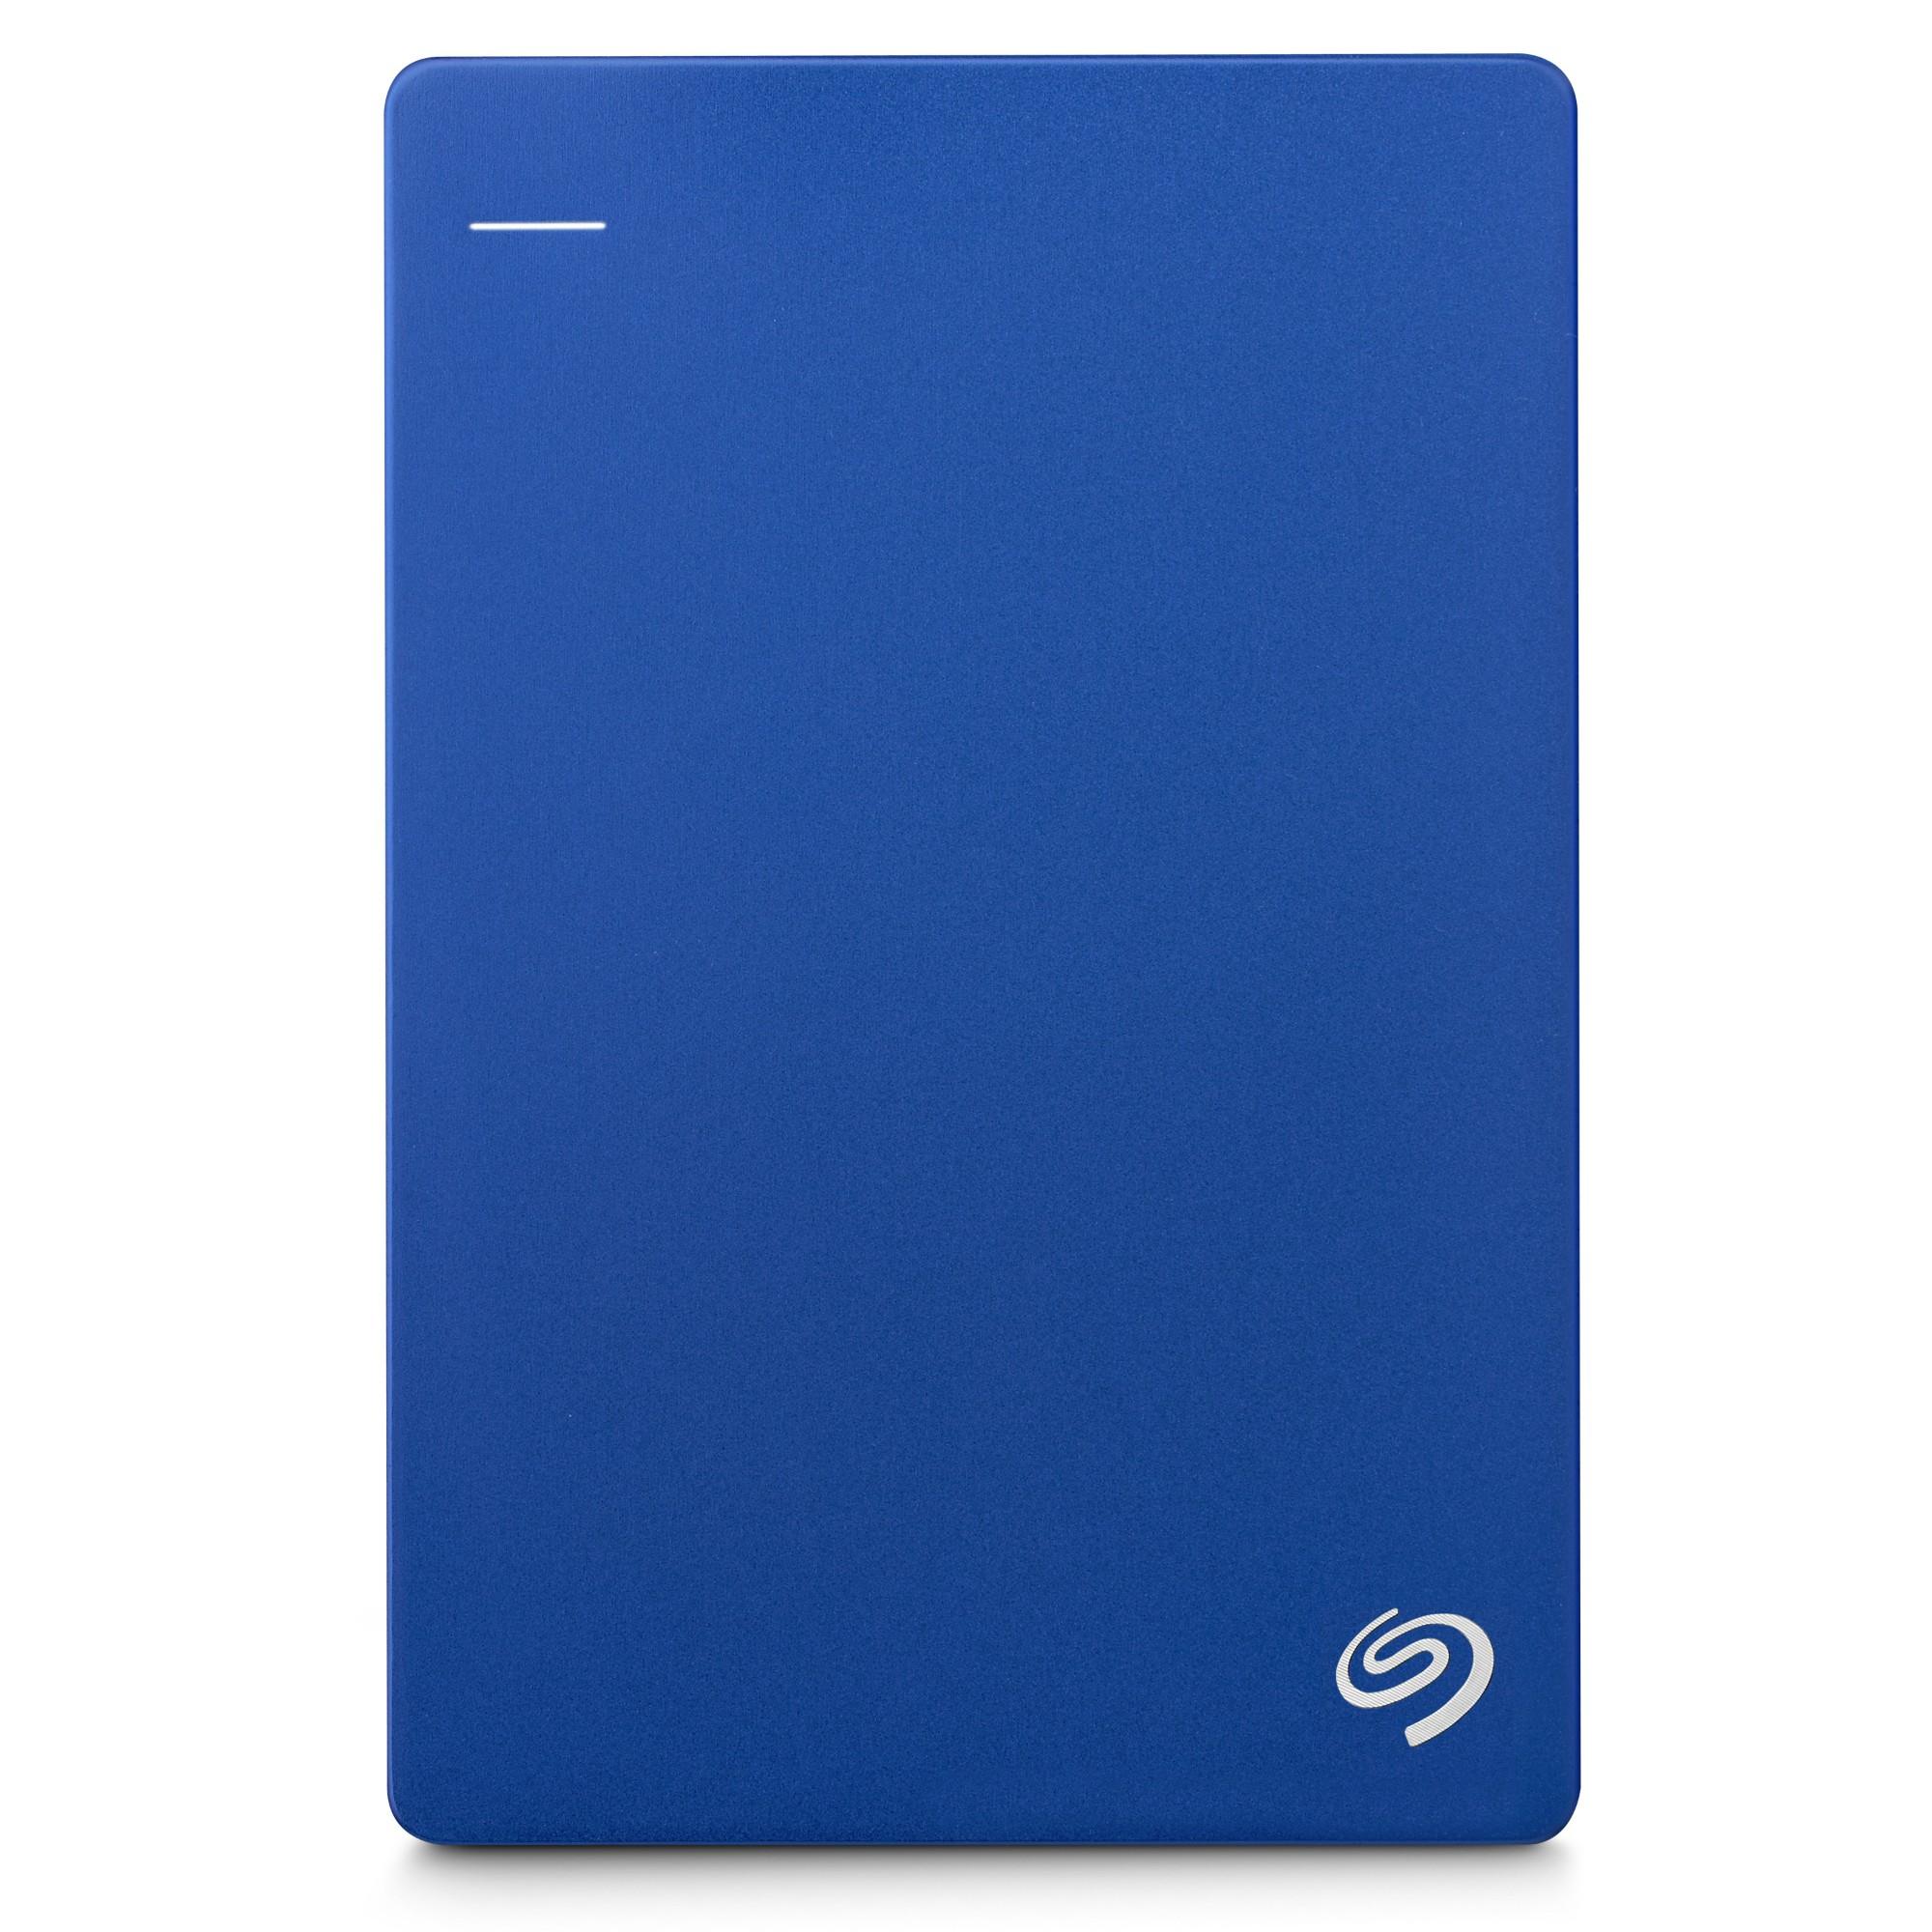 Seagate Backup Plus Slim 1000GB Blue external hard drive